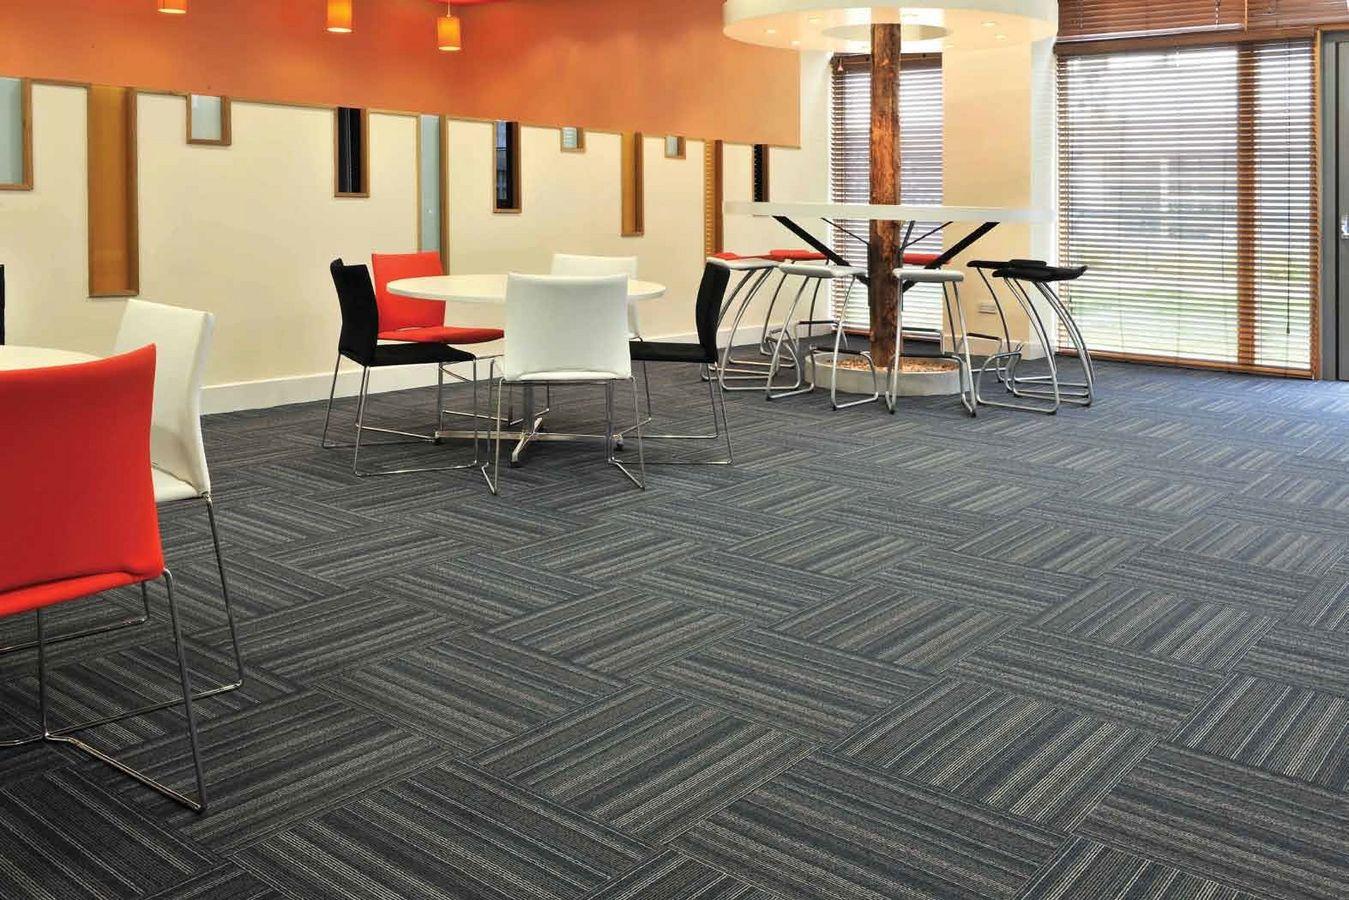 office carpet tiles DUWHNJN